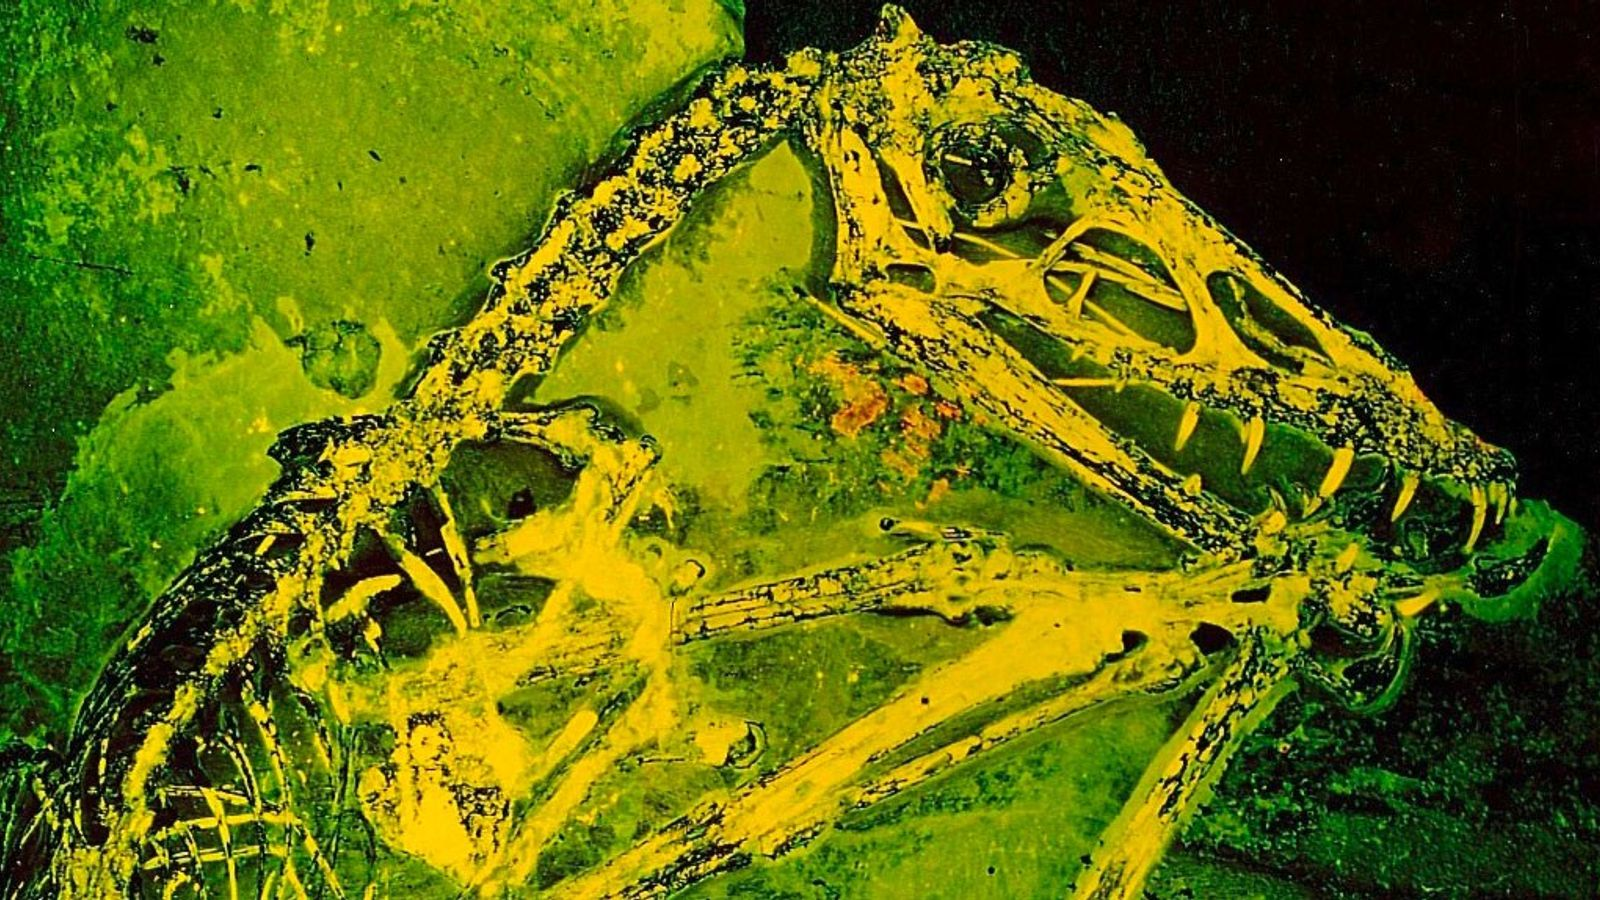 Flugsaurier-Fossil